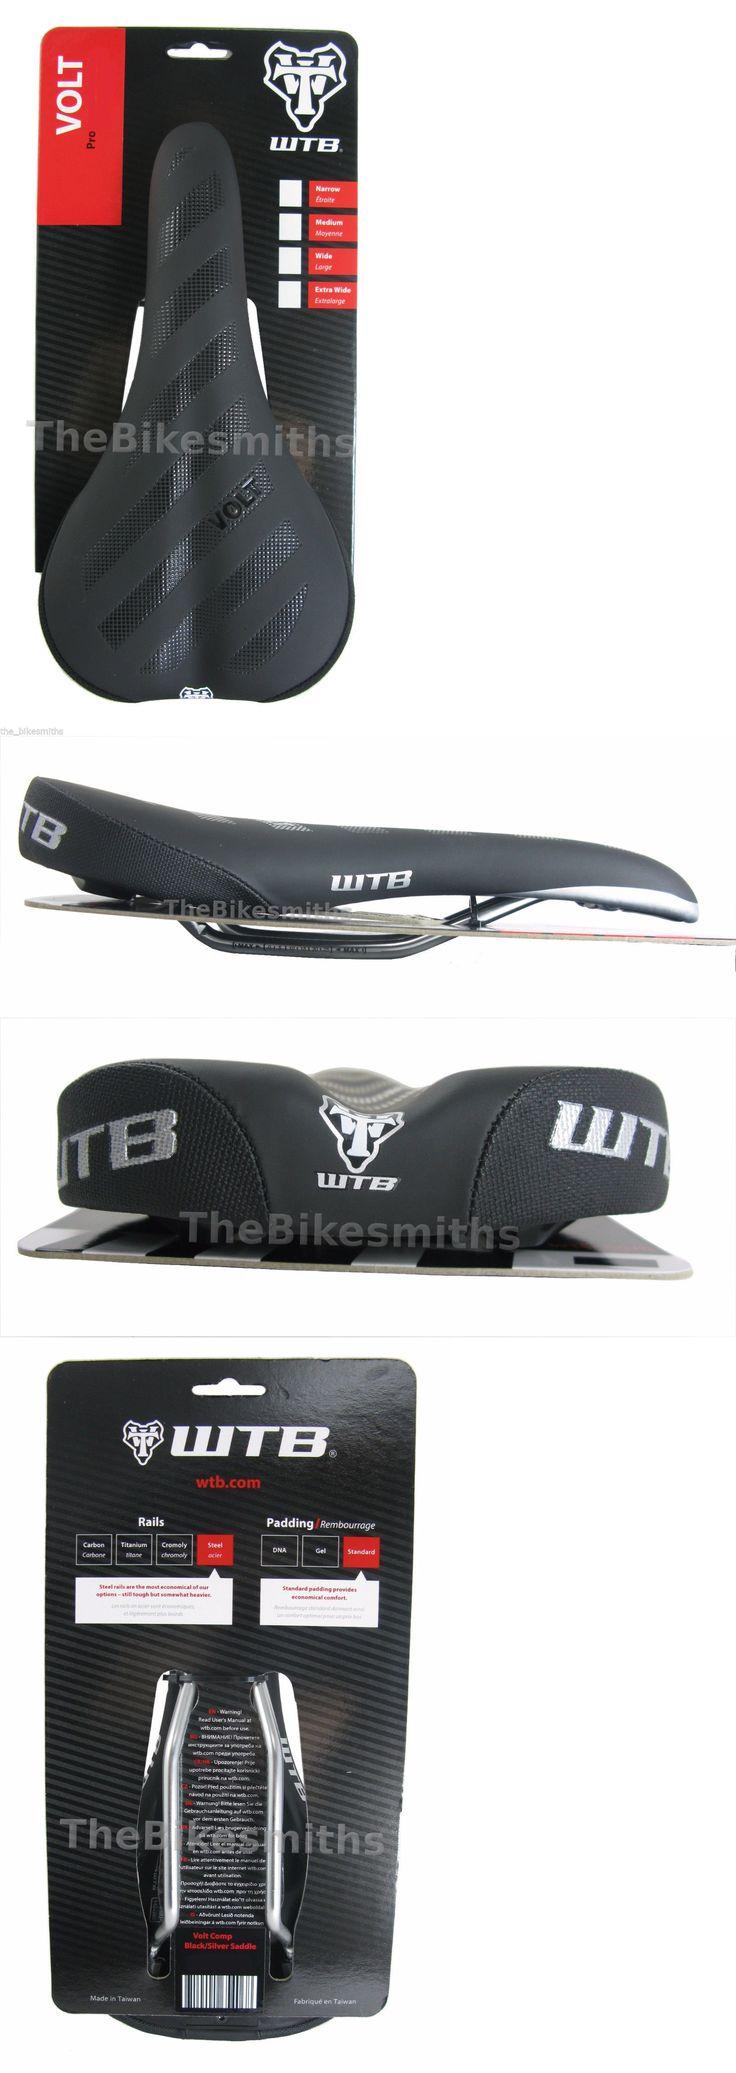 Saddles Seats 177822: Wtb Volt Comp Black Bike Saddle Unisex Seat Steel 135Mm 142Mm 150Mm -> BUY IT NOW ONLY: $35.95 on eBay!